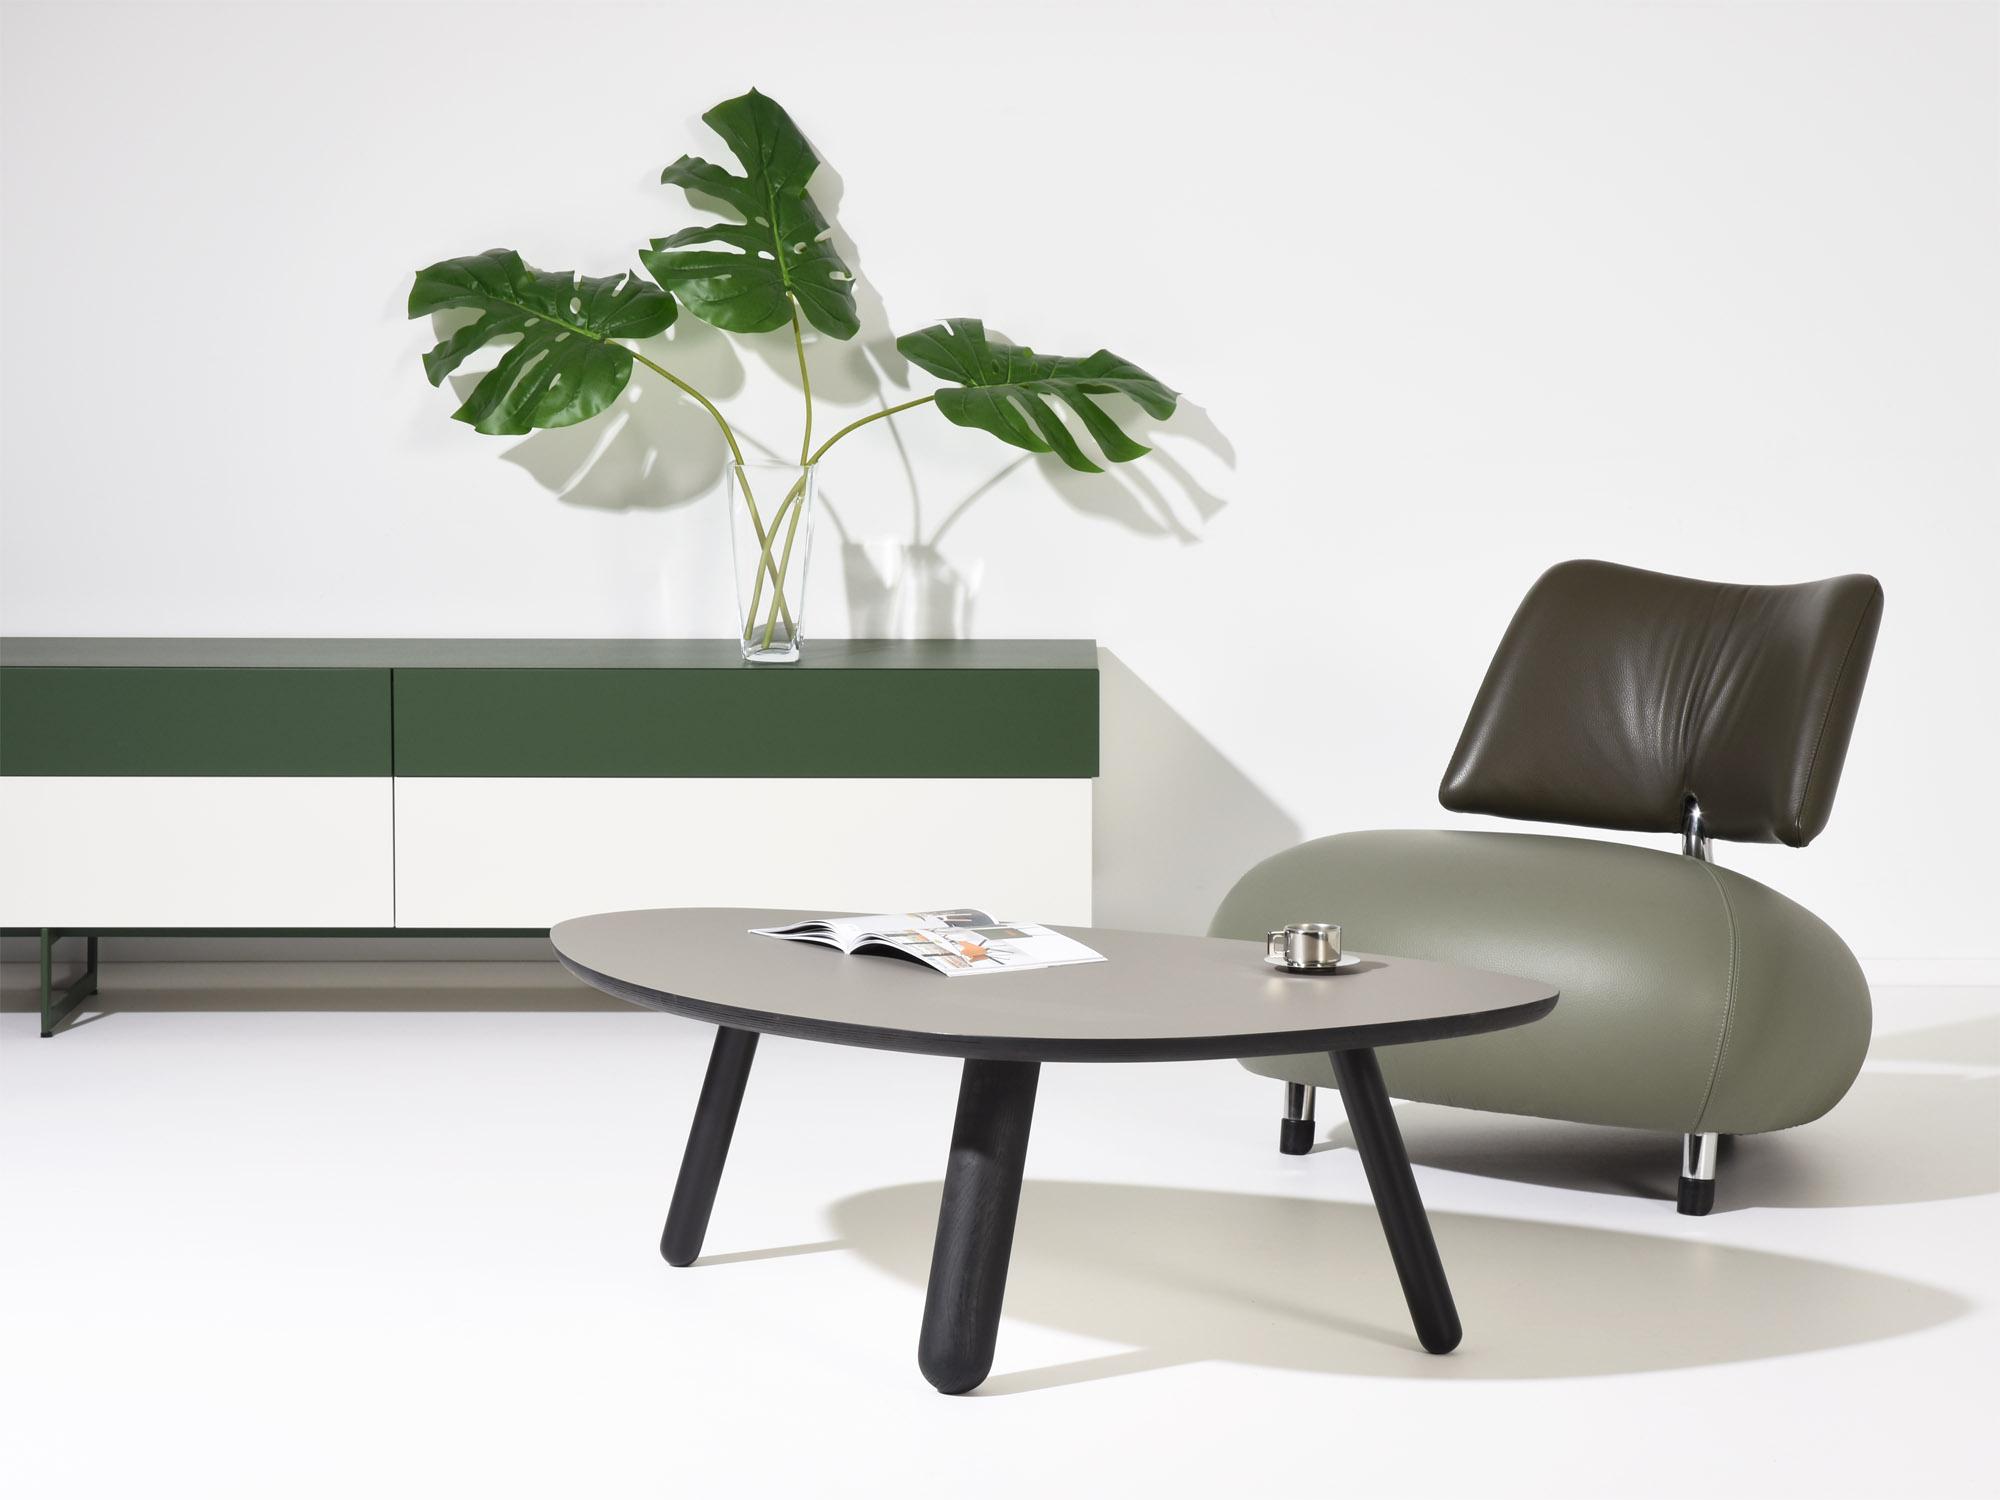 Castelijn Salontafel Circlips - Design by Dick Spierenburg